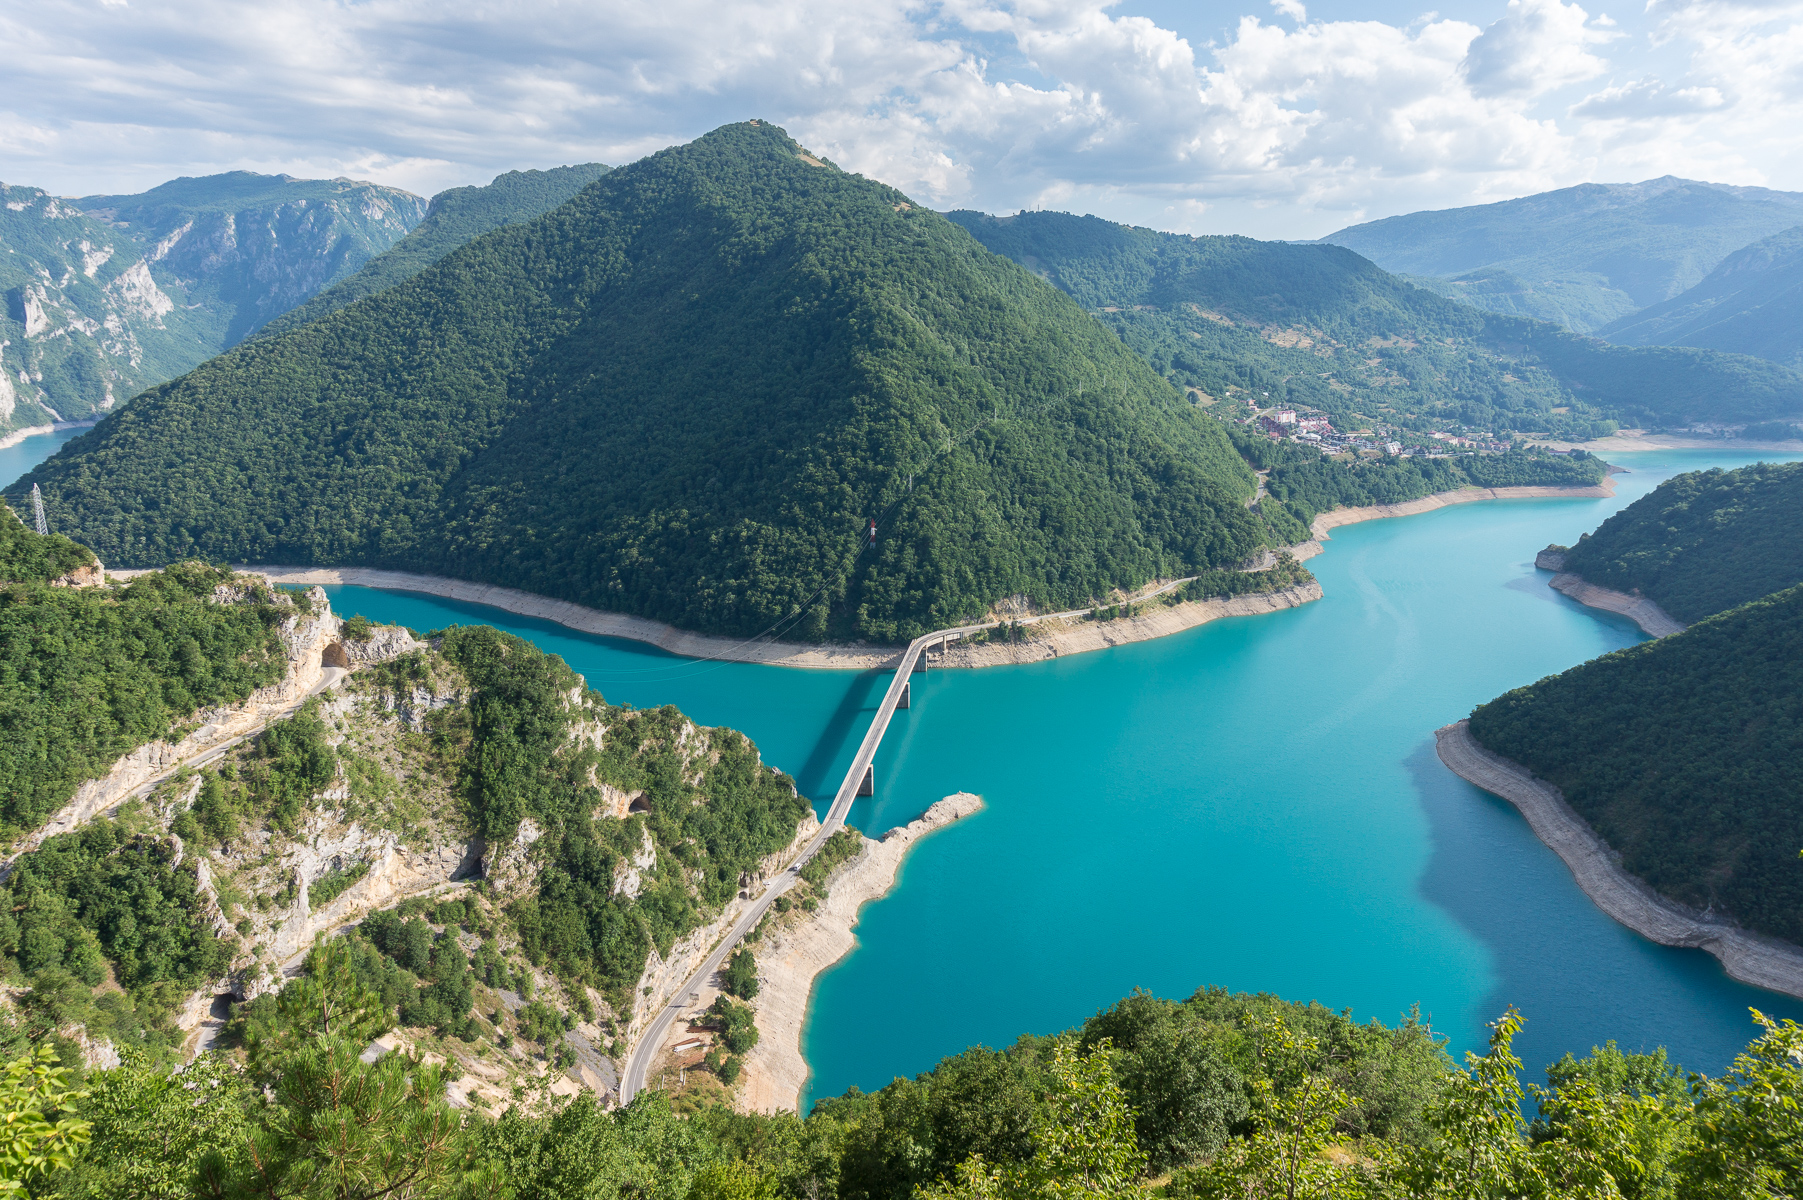 Pluzine, Montenegro